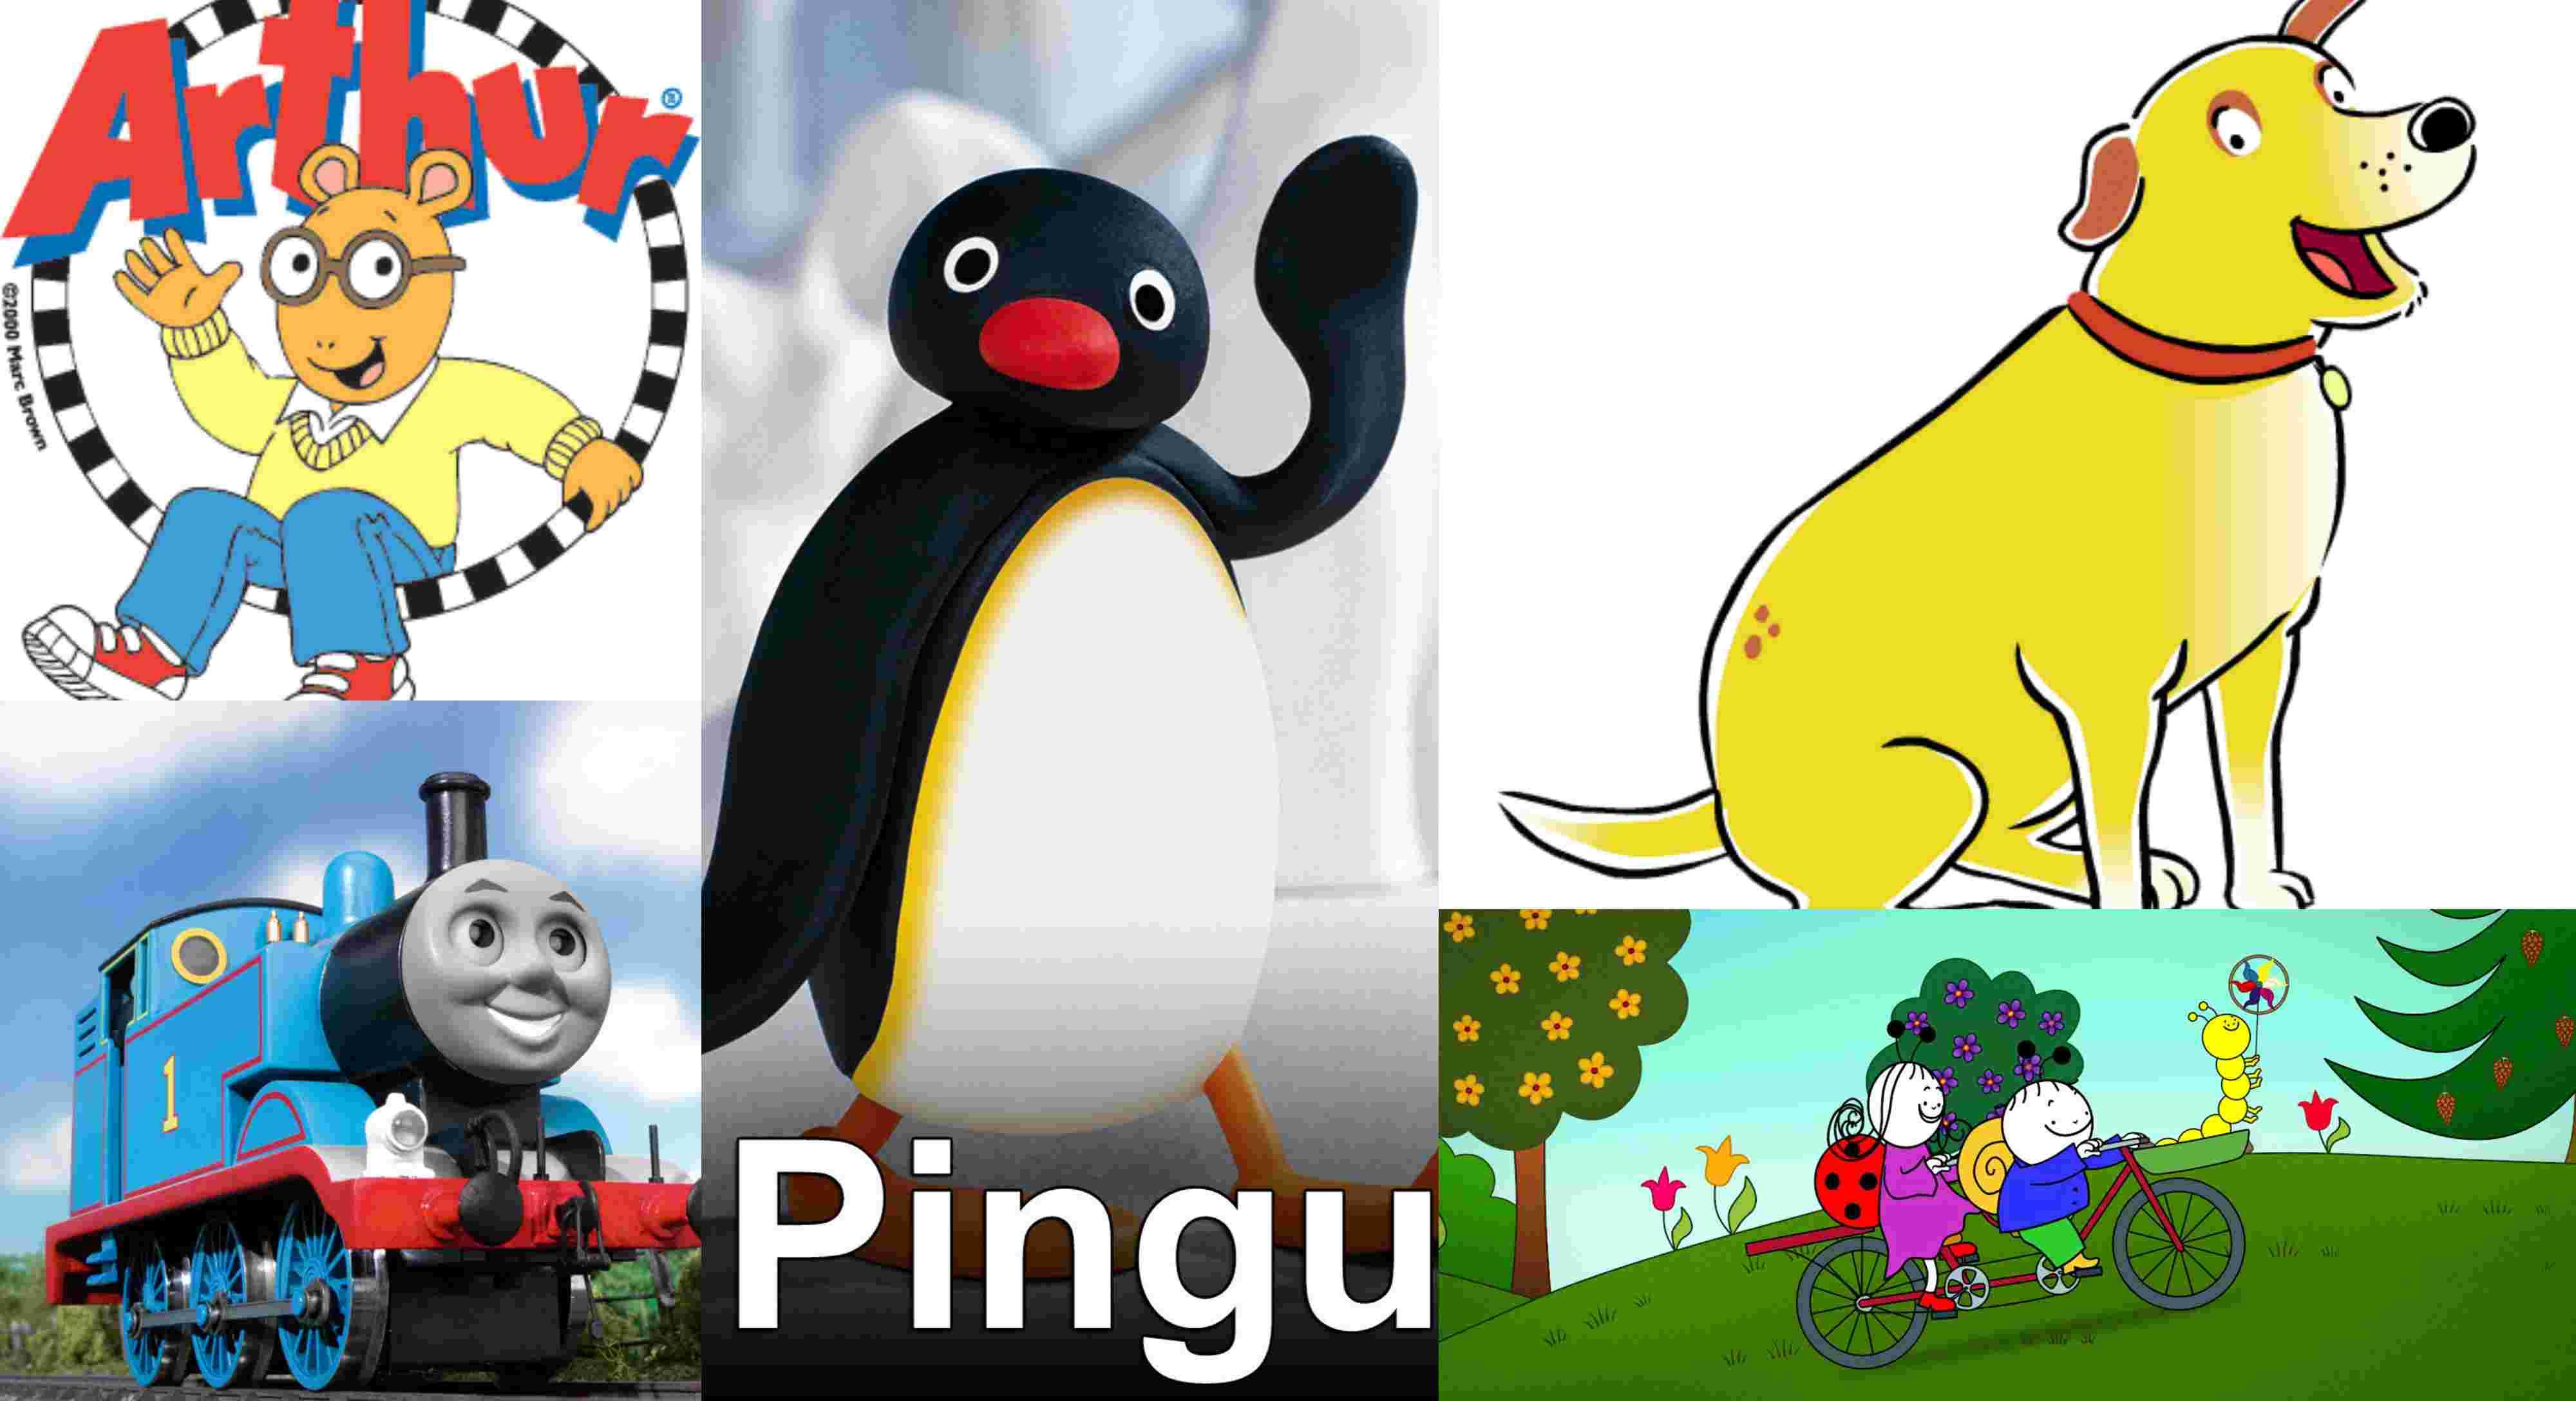 5 desene animate dublate in romana linistite cu mesaj educational